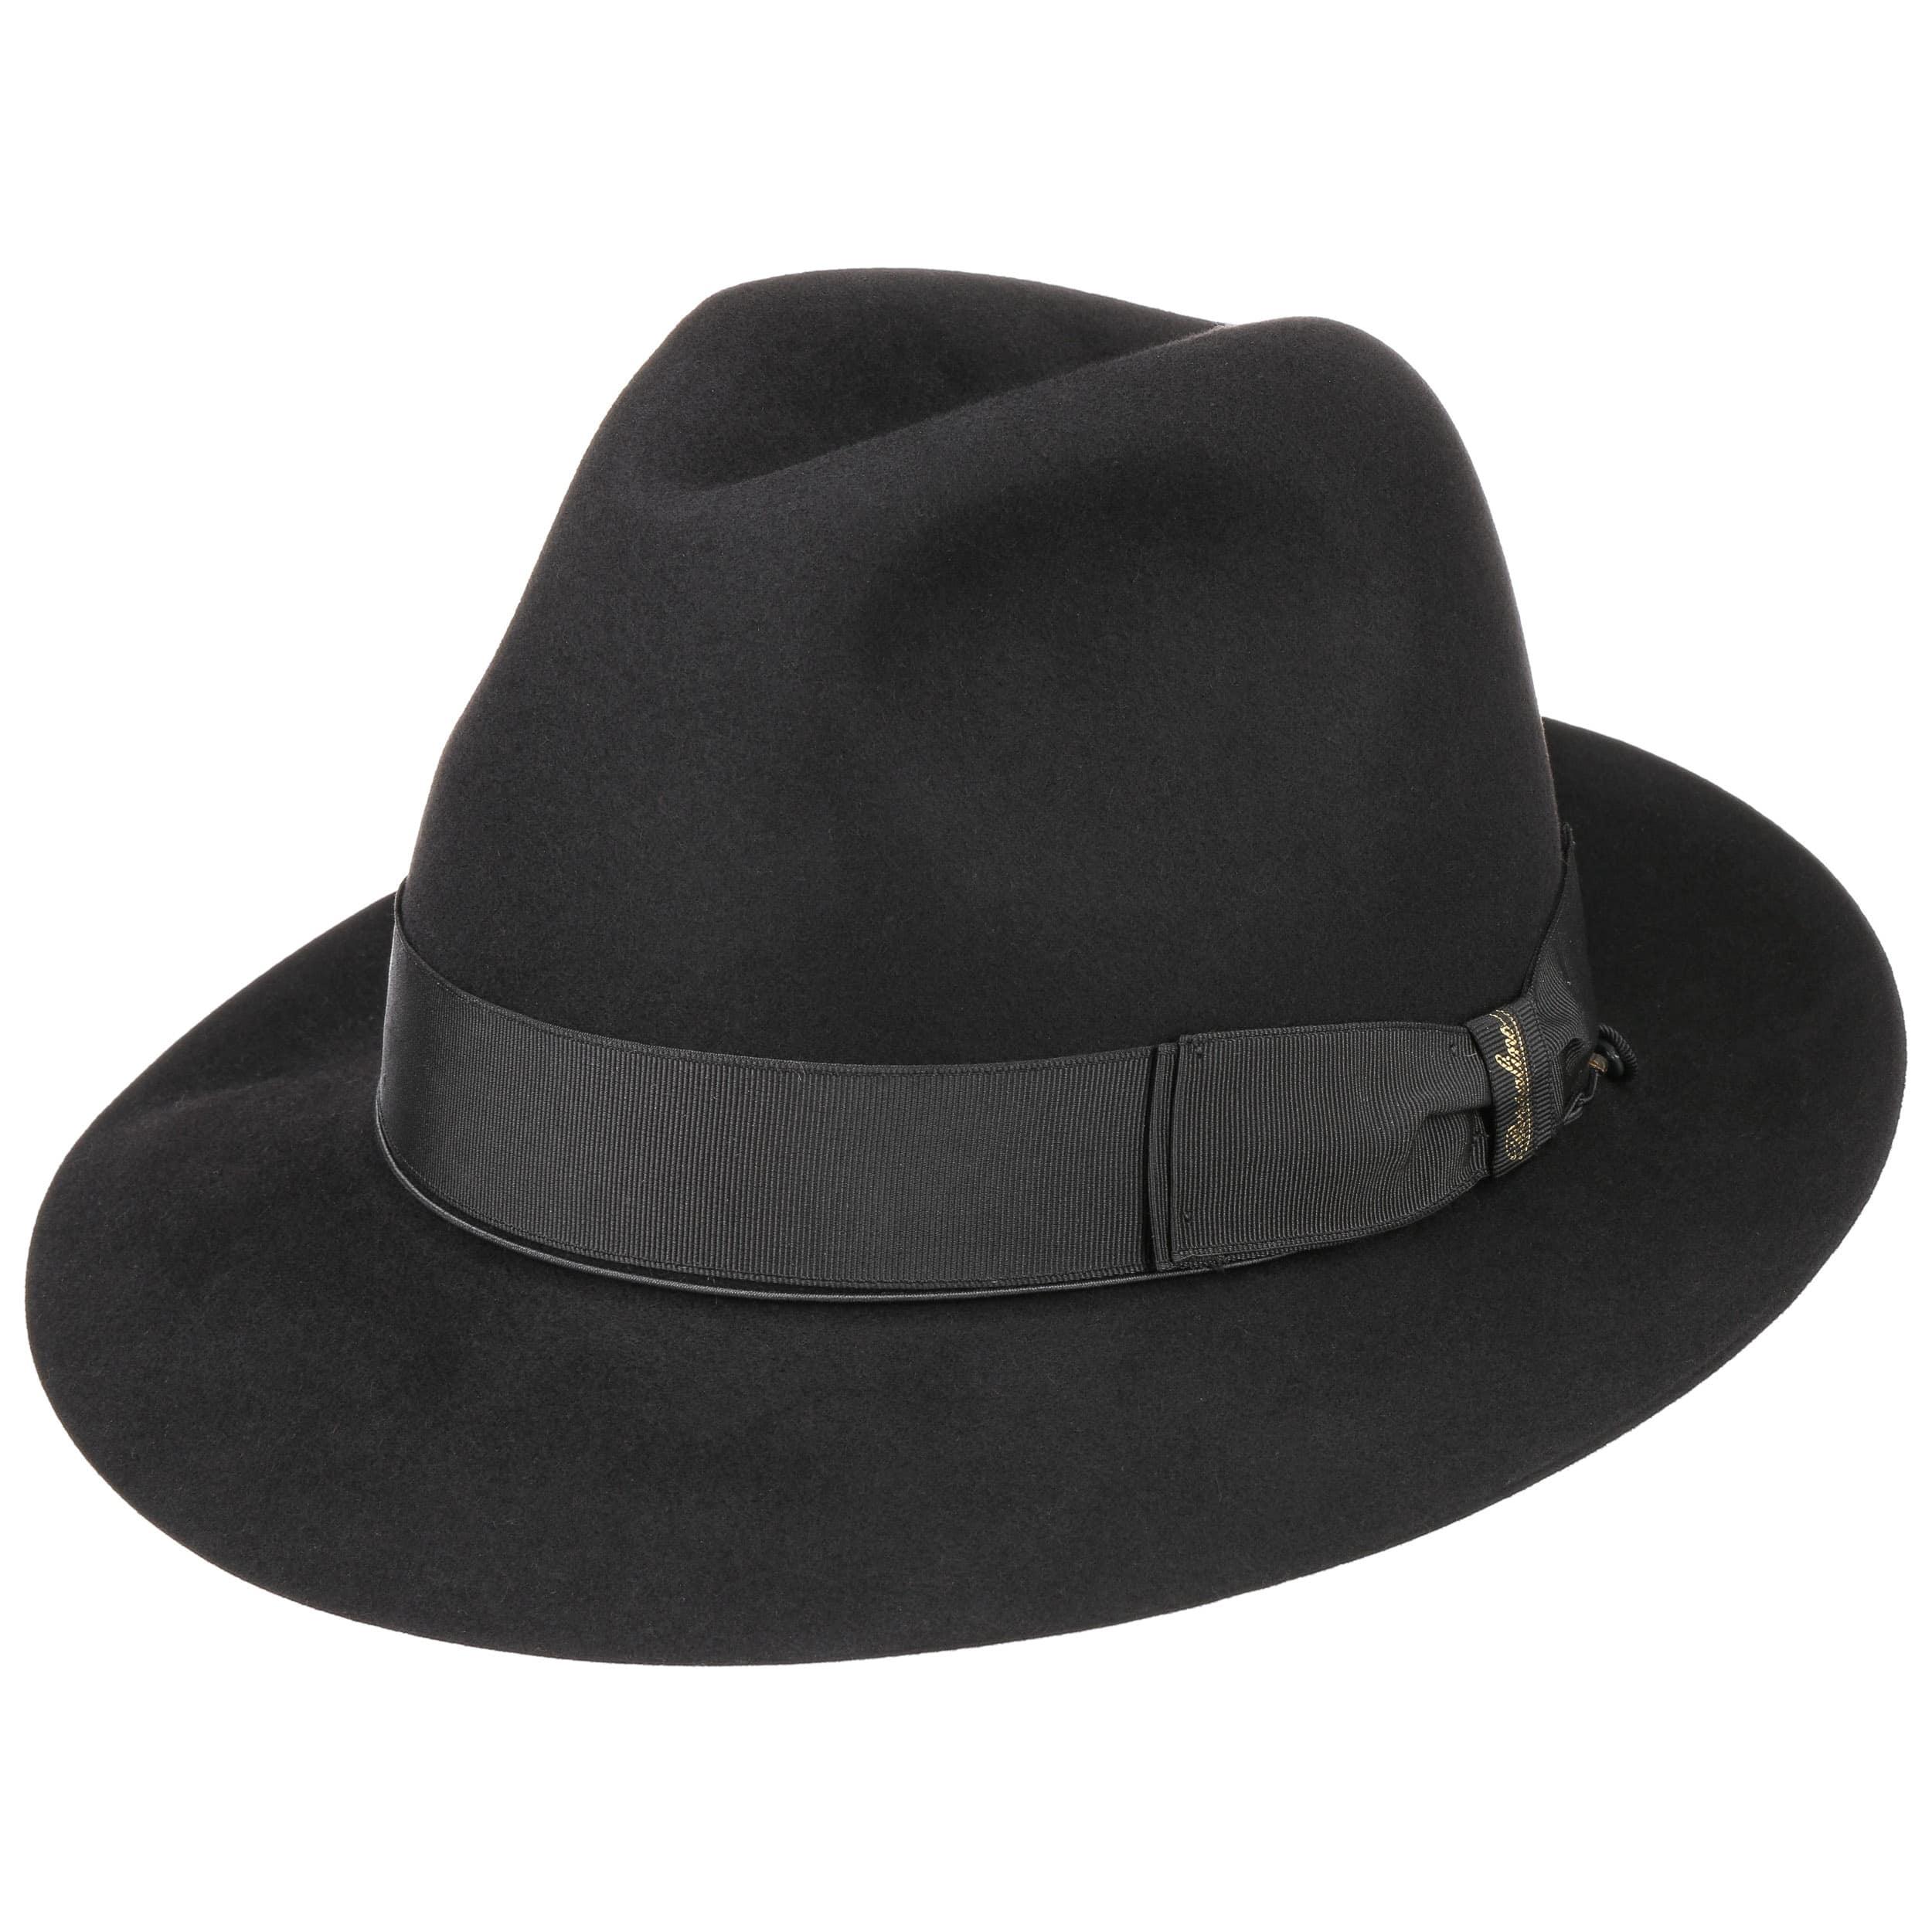 Sombrero de Pelo de Hombre by Borsalino - Sombreros - sombreroshop.es 795e4de2a2b